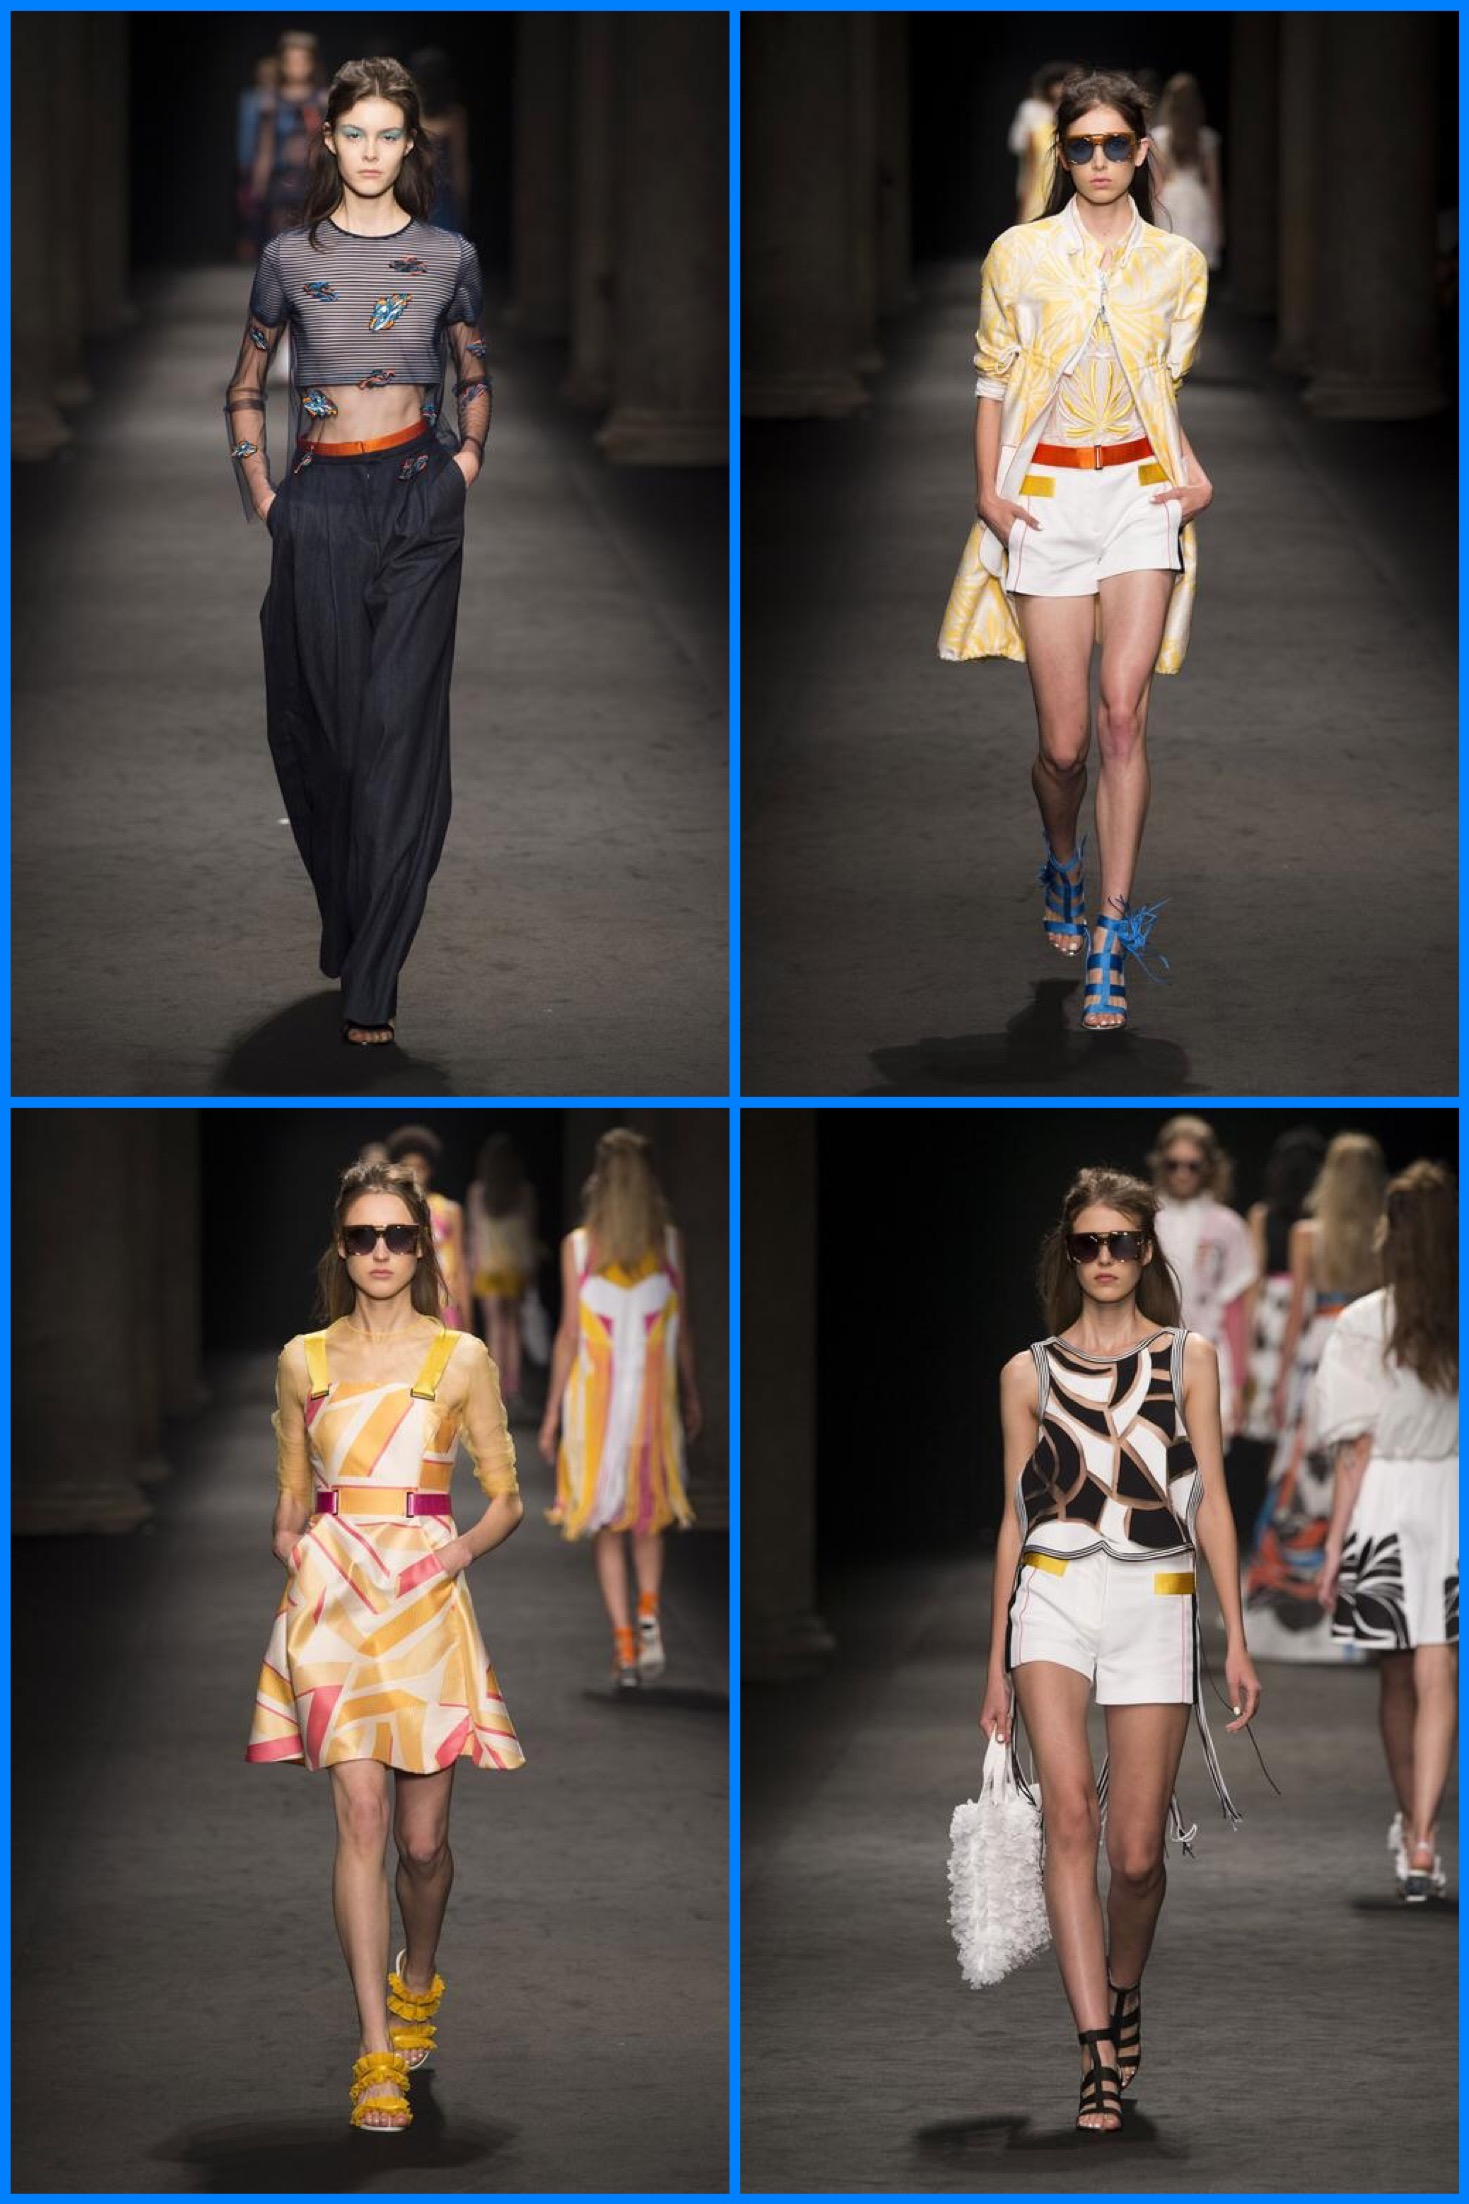 milano-fashion-week-pret-a-porter-spring-summer-2017-style-byblos-milano